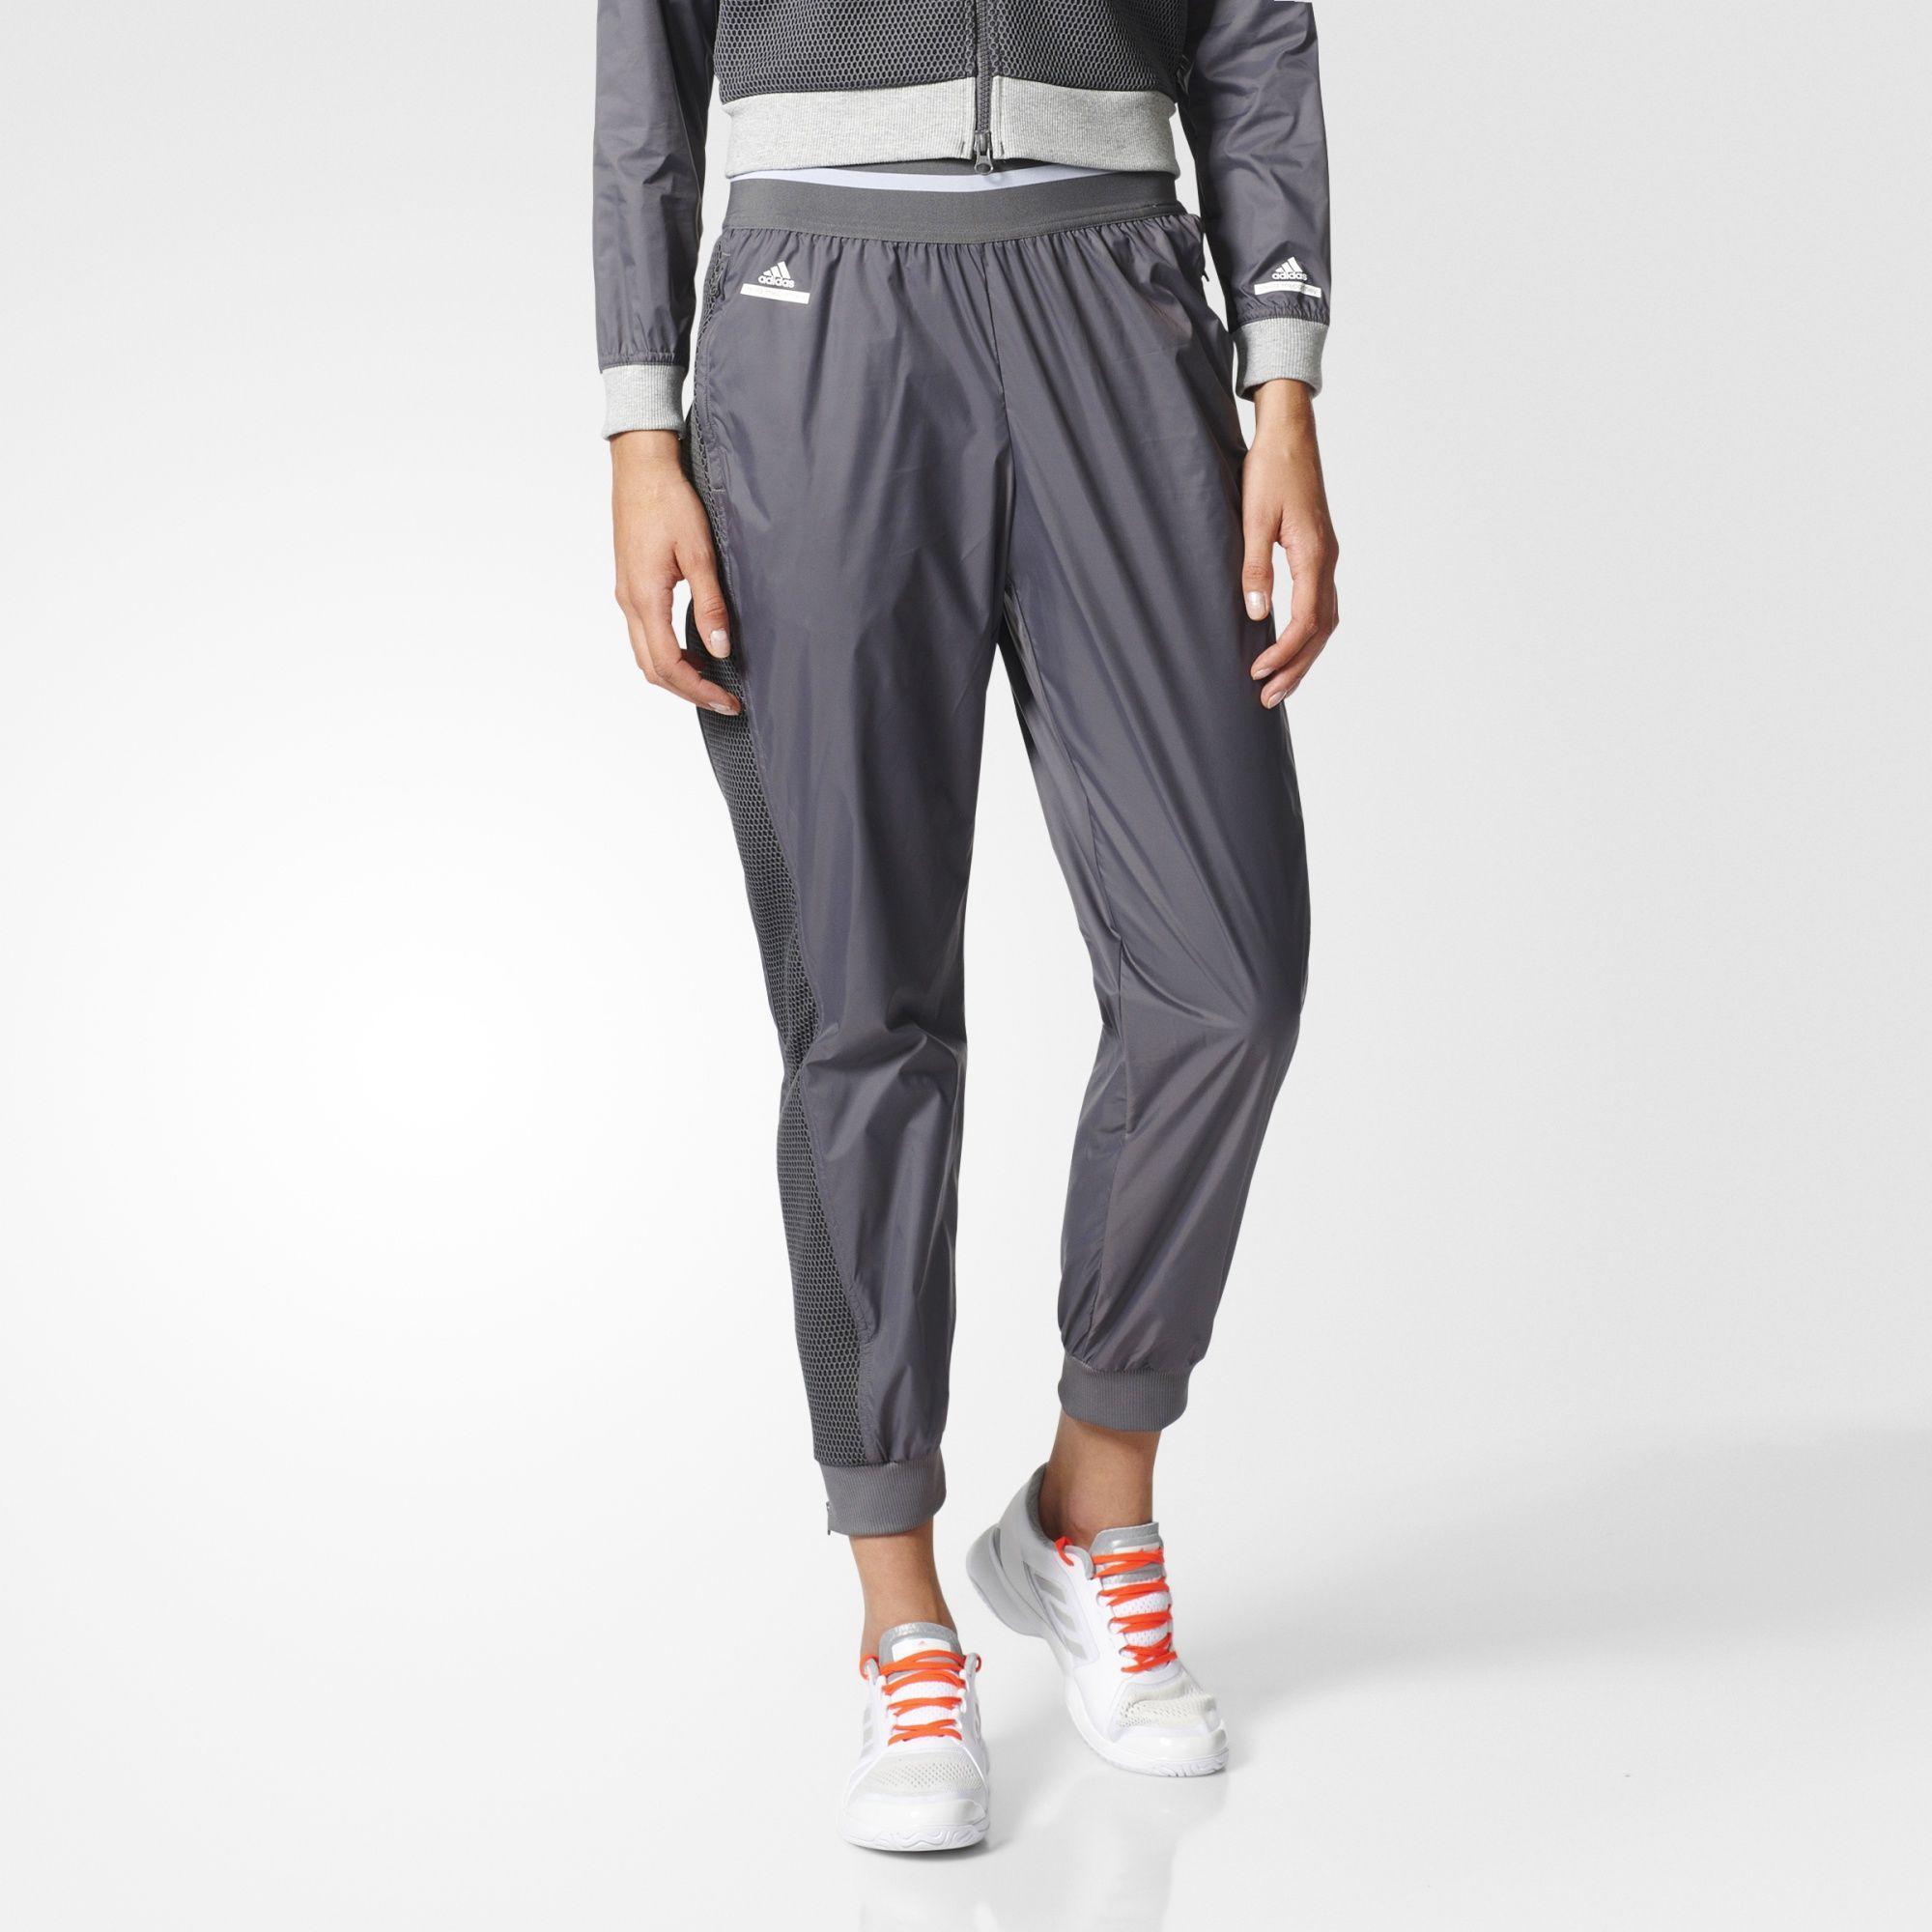 9b7a6f31fc66 adidas - Barricade Pants